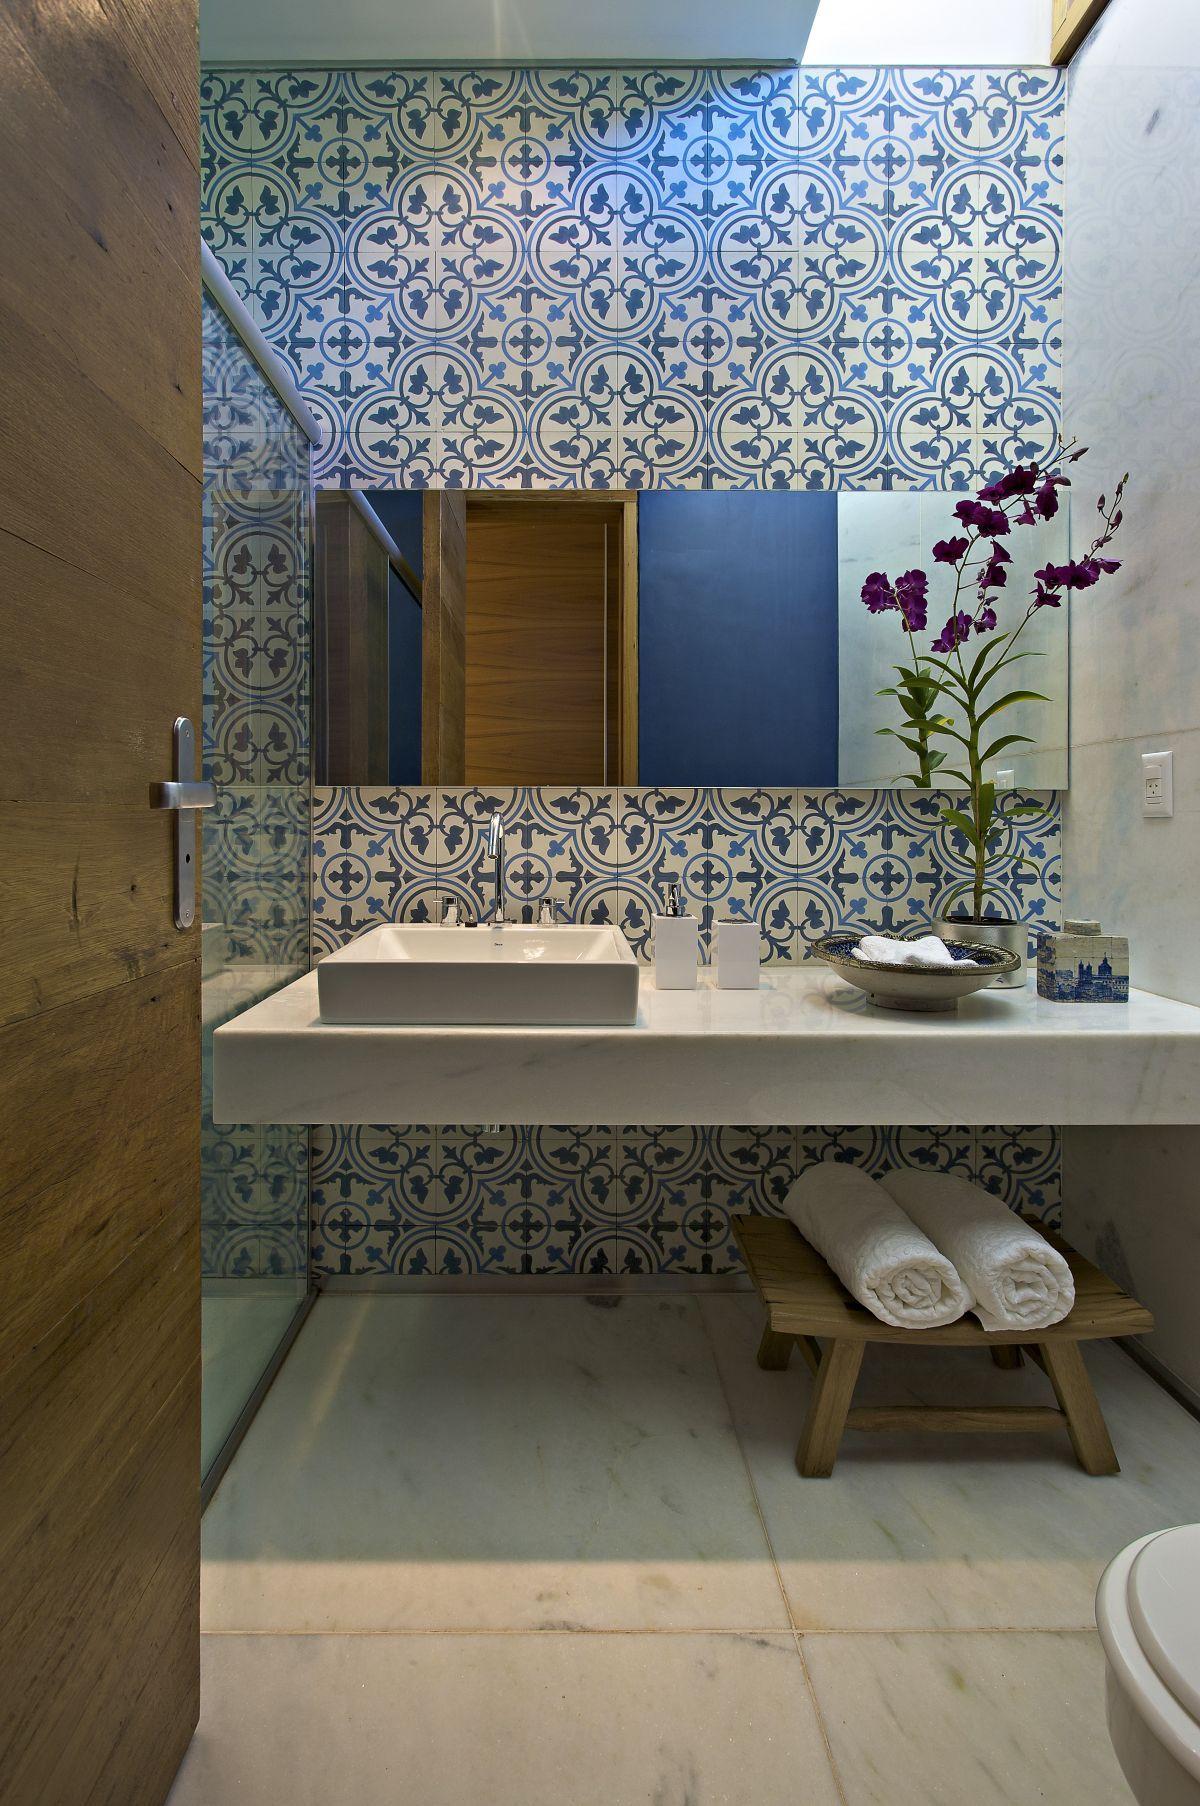 1000+ images about Bathroom Design on Pinterest - ^